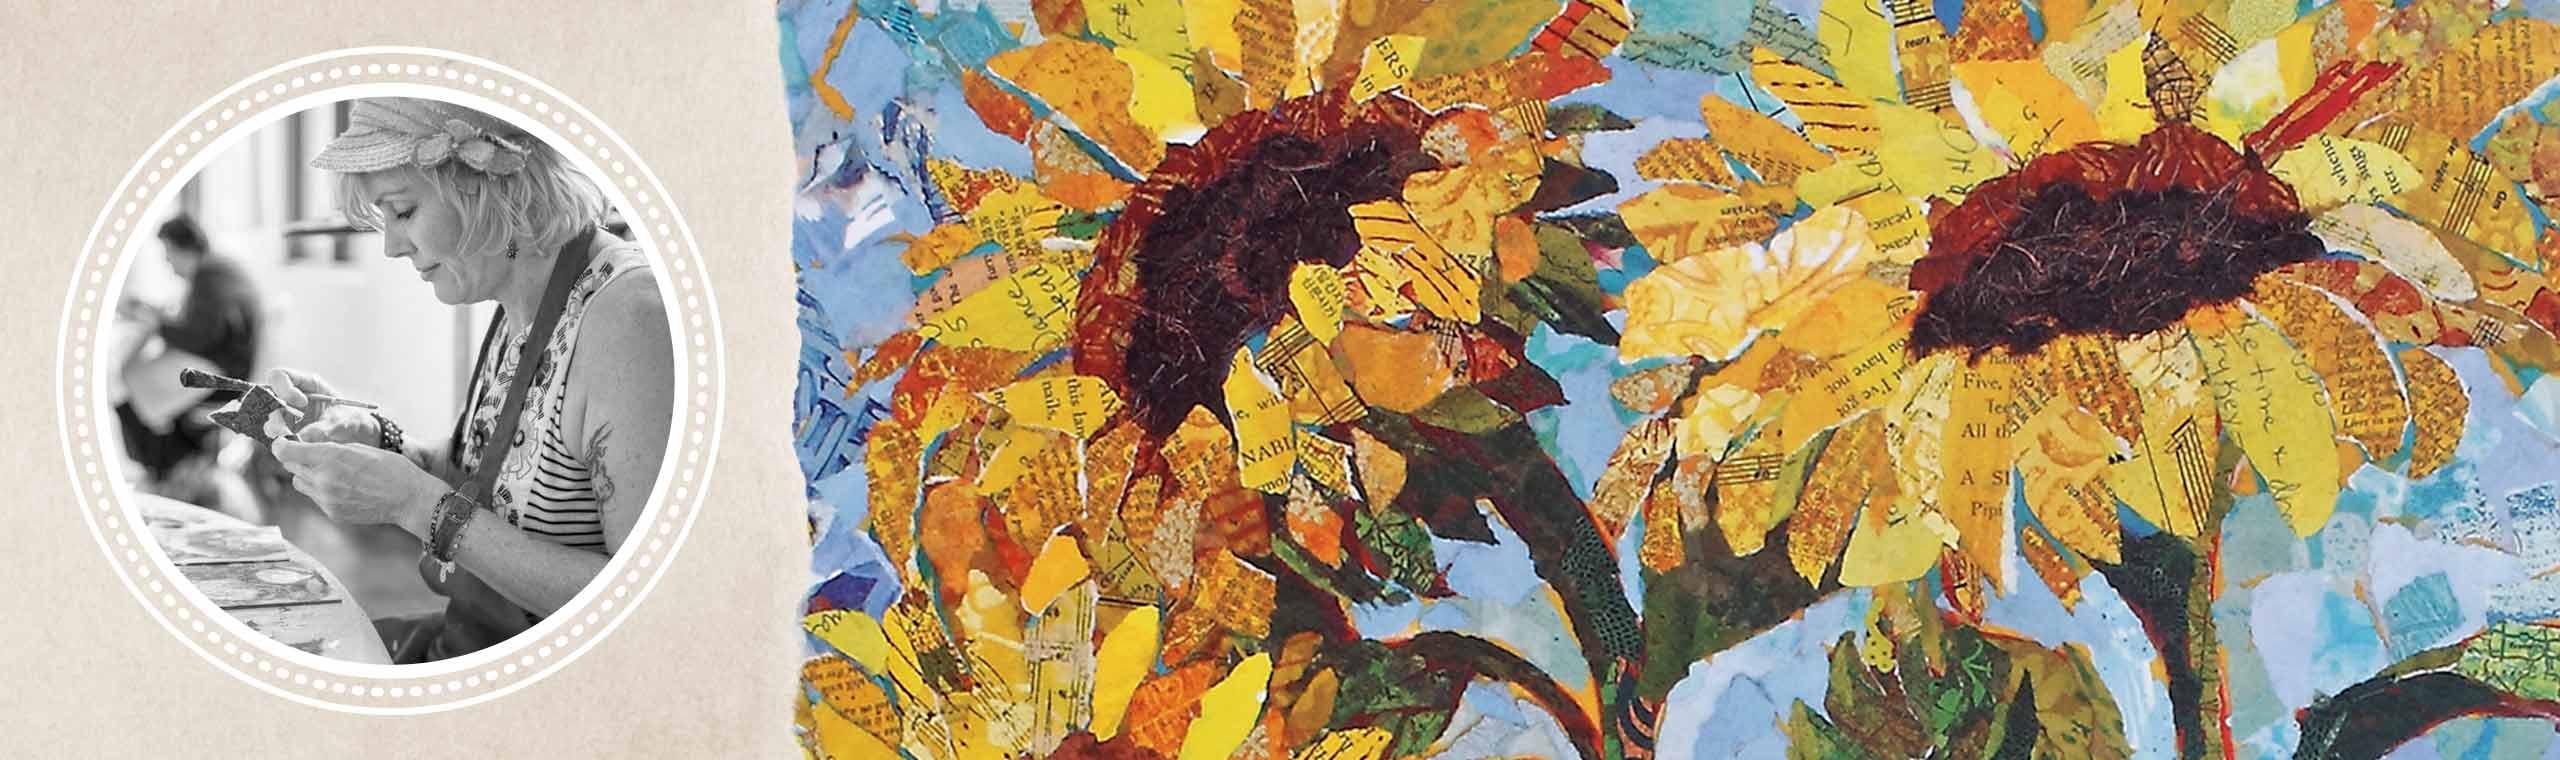 Portrait of artist Elizabeth St. Hilaire and her vibrant paper-collage artwork